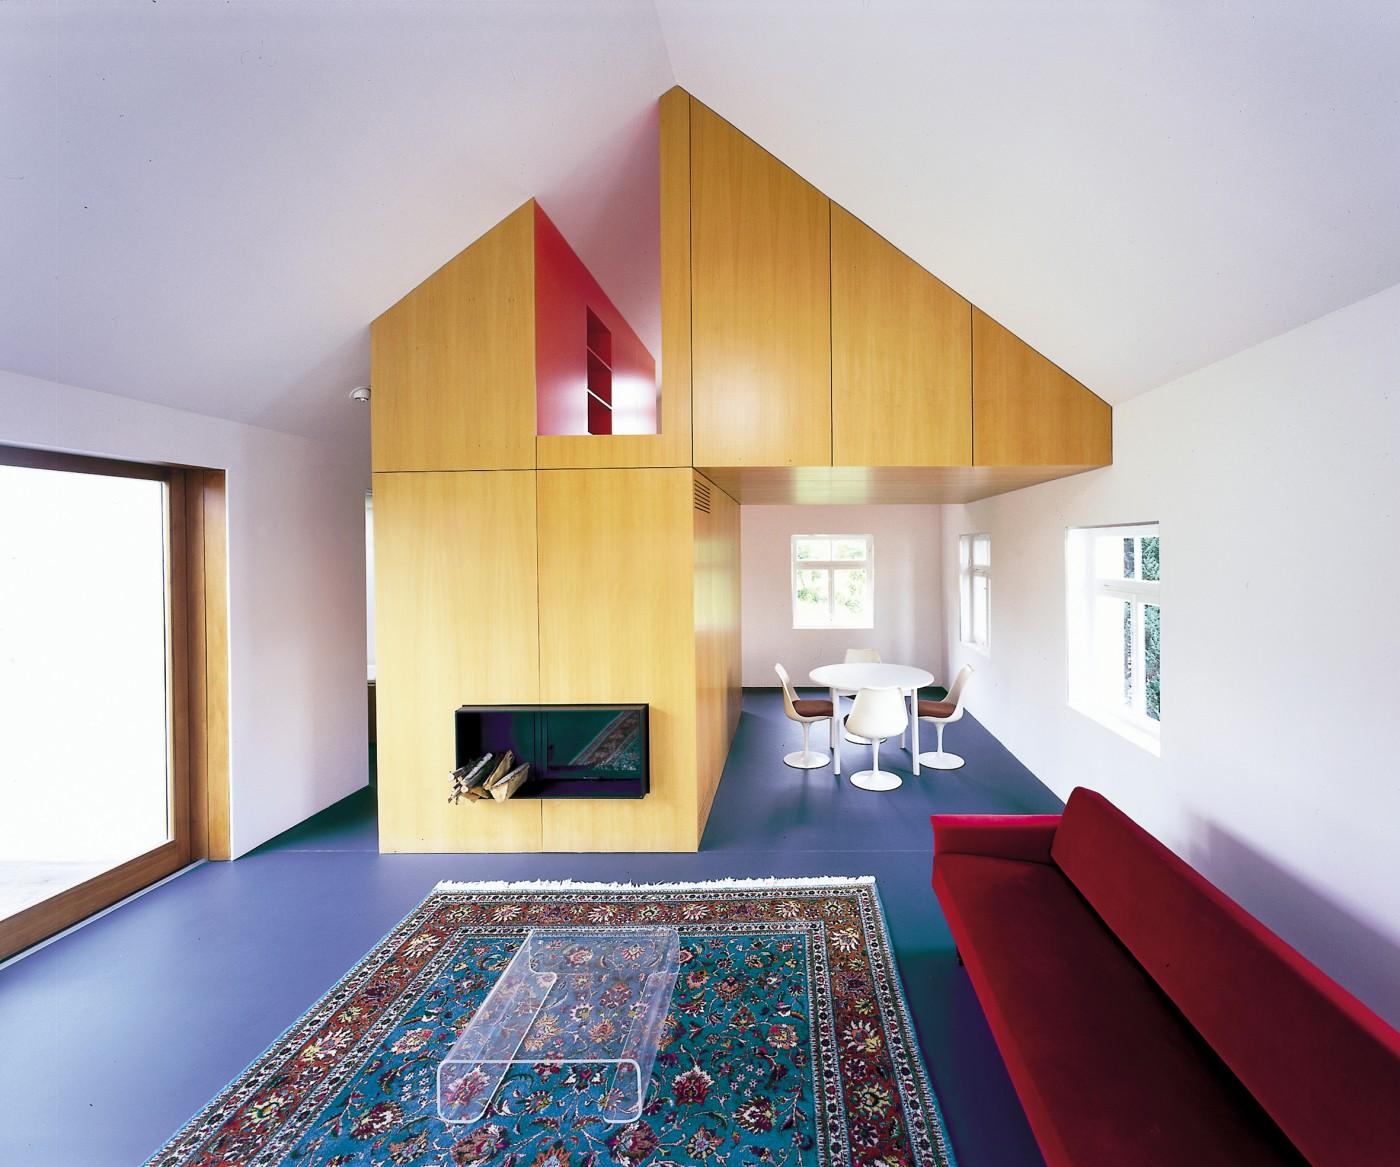 Residence H   bfa   büro für architektur